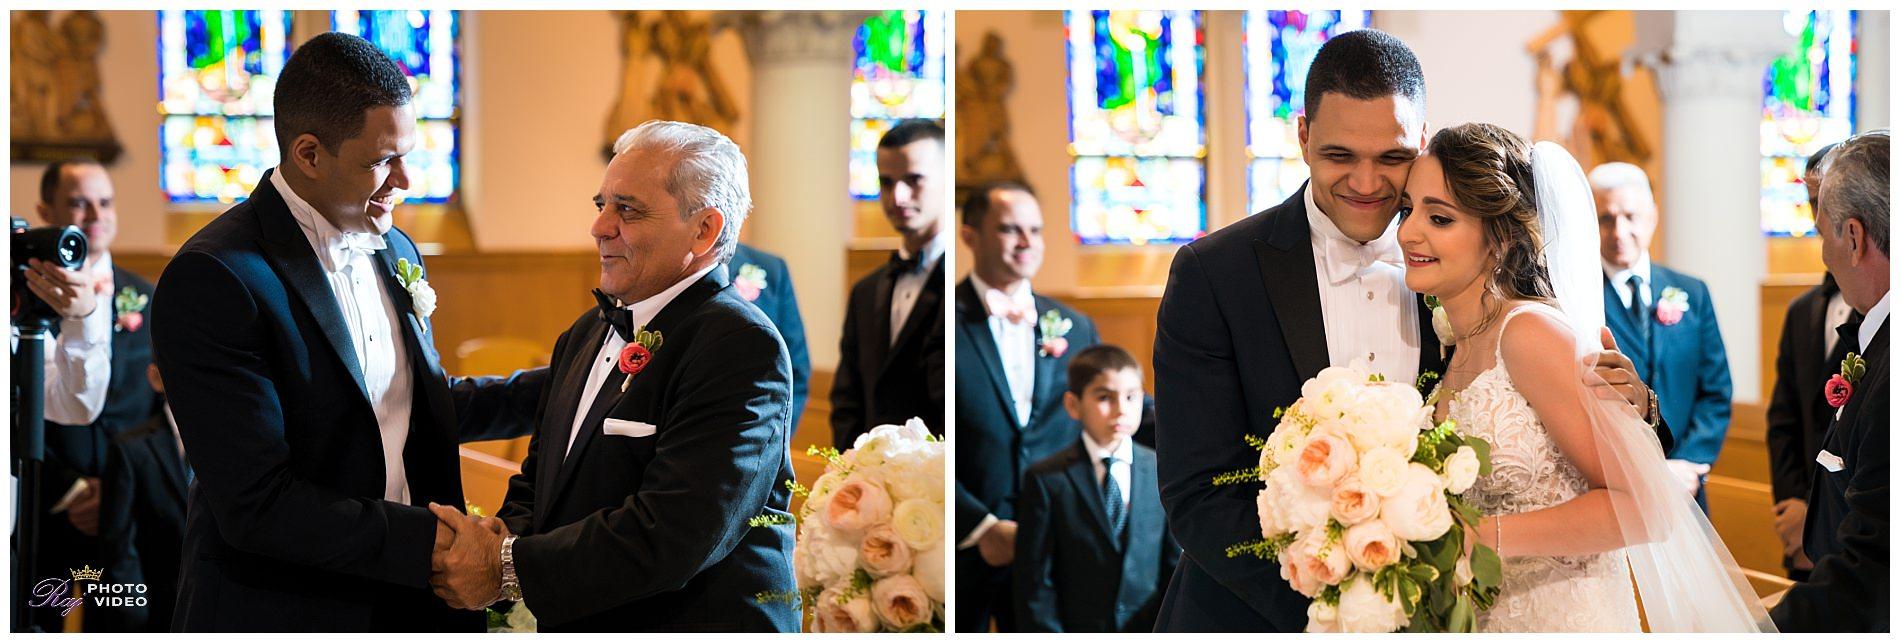 St-Valentines-Catholic-Church-Bloomfield-NJ-Wedding-Yanet-Jose-7.jpg